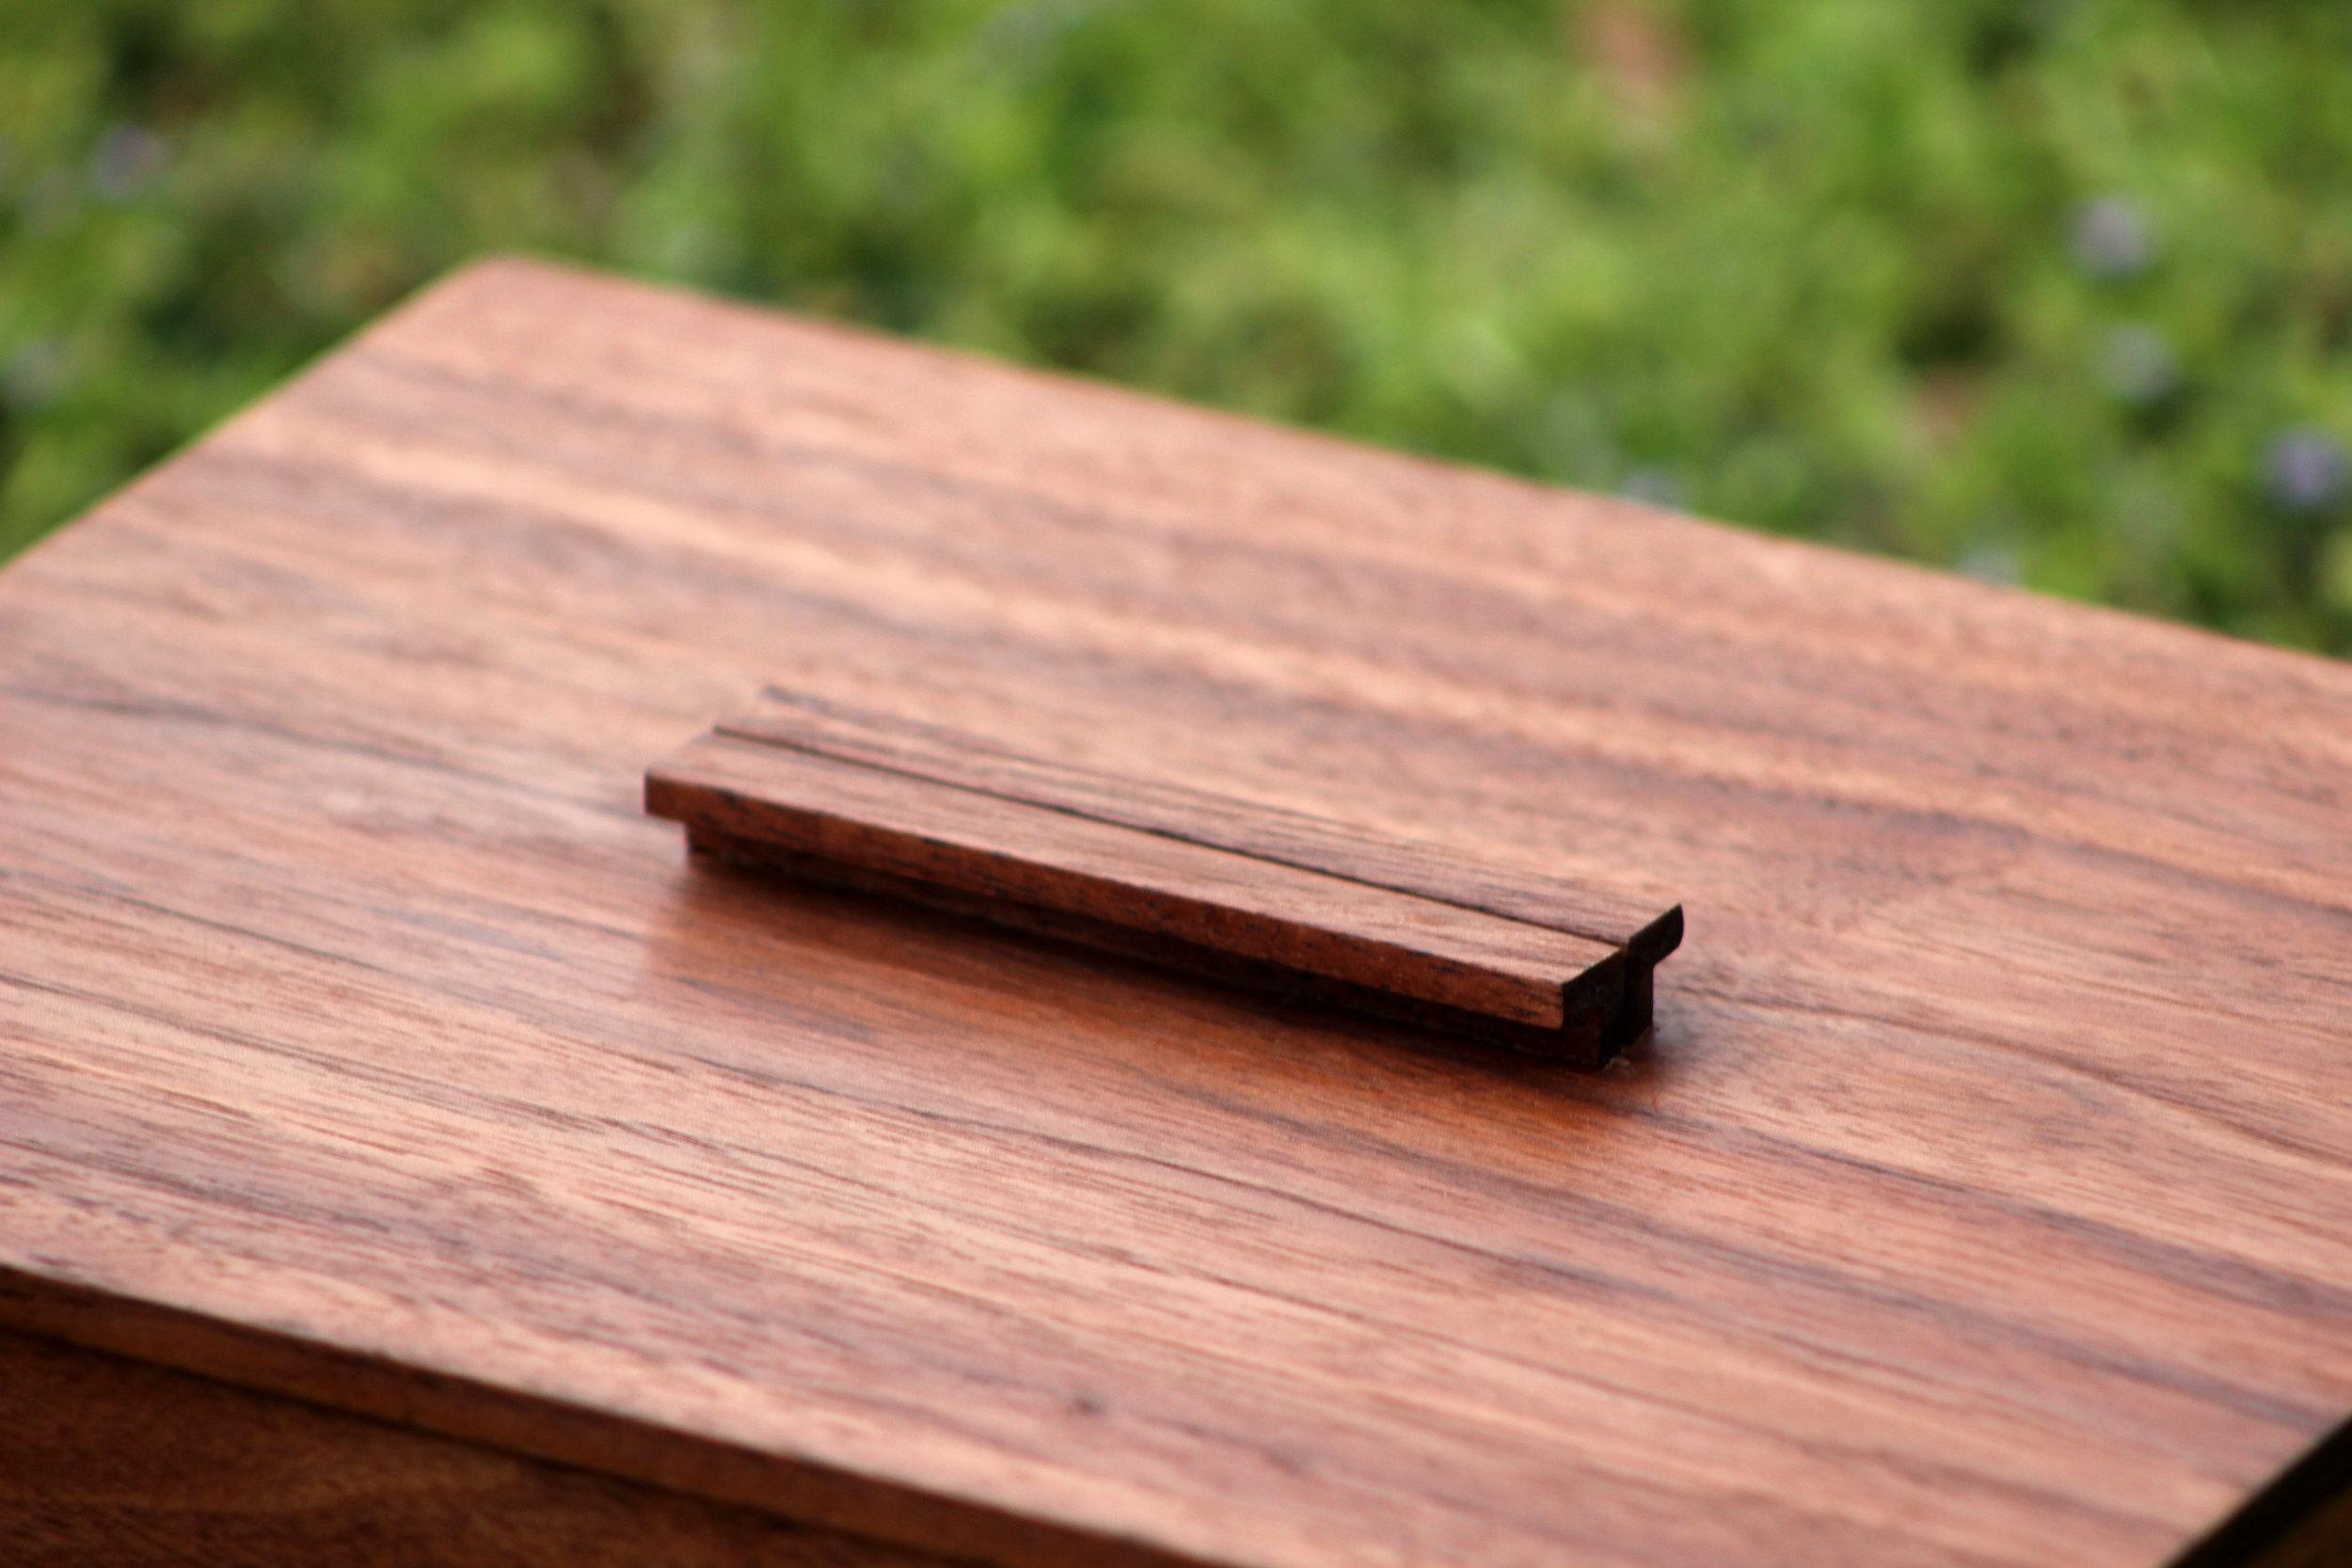 Walnut Bridal Box. custom handmade wooden gifts. wedding gift. sallie plumley studio. custom furniture maker. richmond virginia. rva